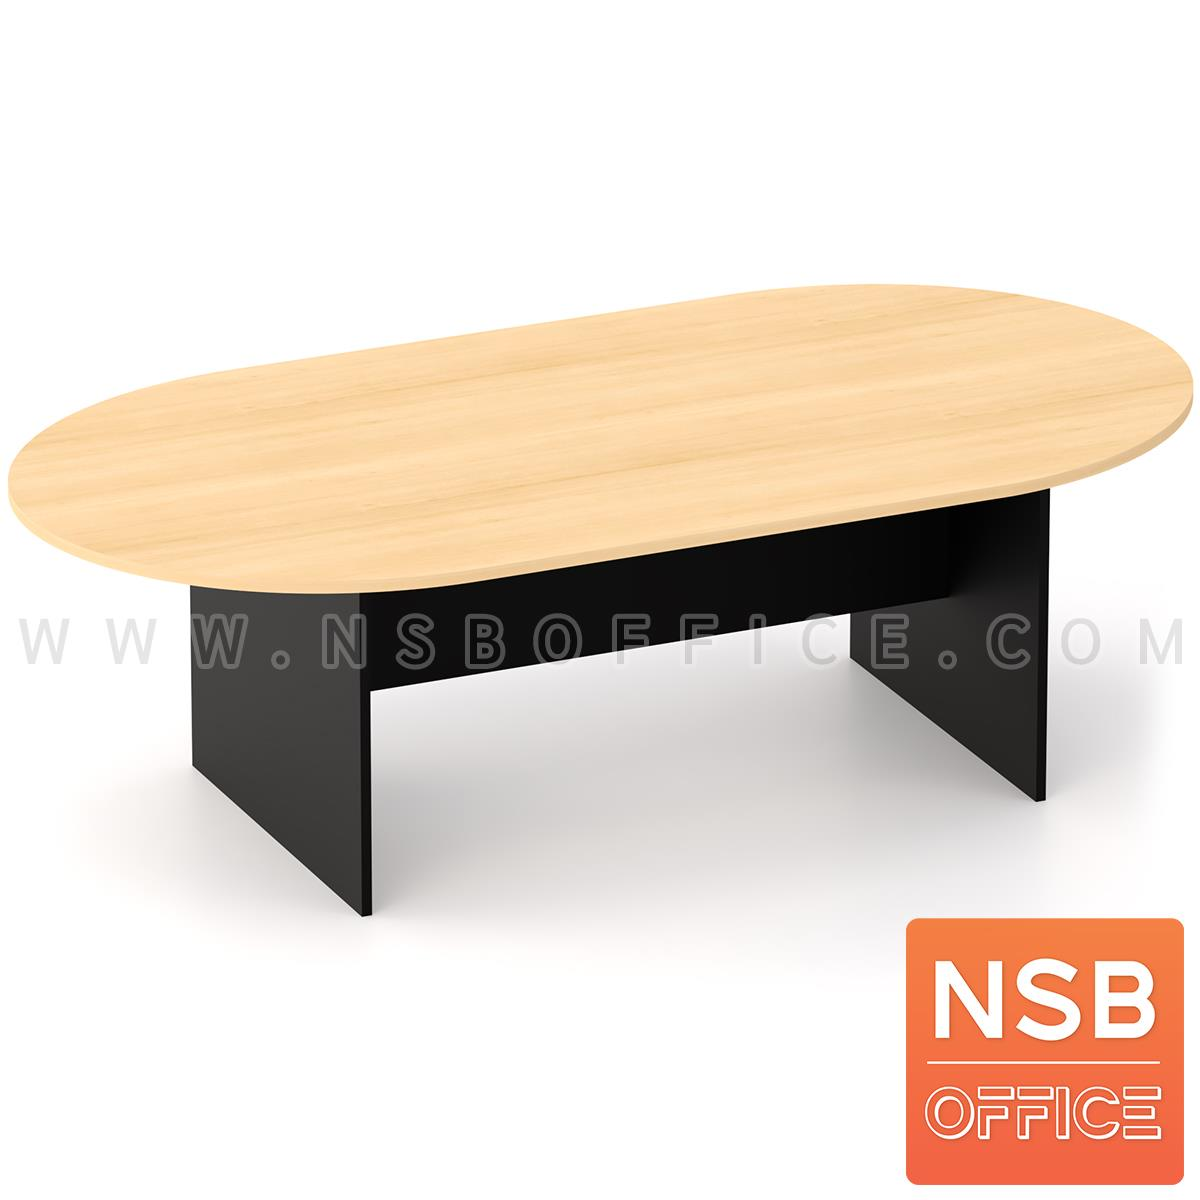 A05A032:โต๊ะประชุมหัวโค้ง  6 ,8 ,10 ที่นั่ง ขนาด 180W ,200W ,240W cm.  ขาไม้